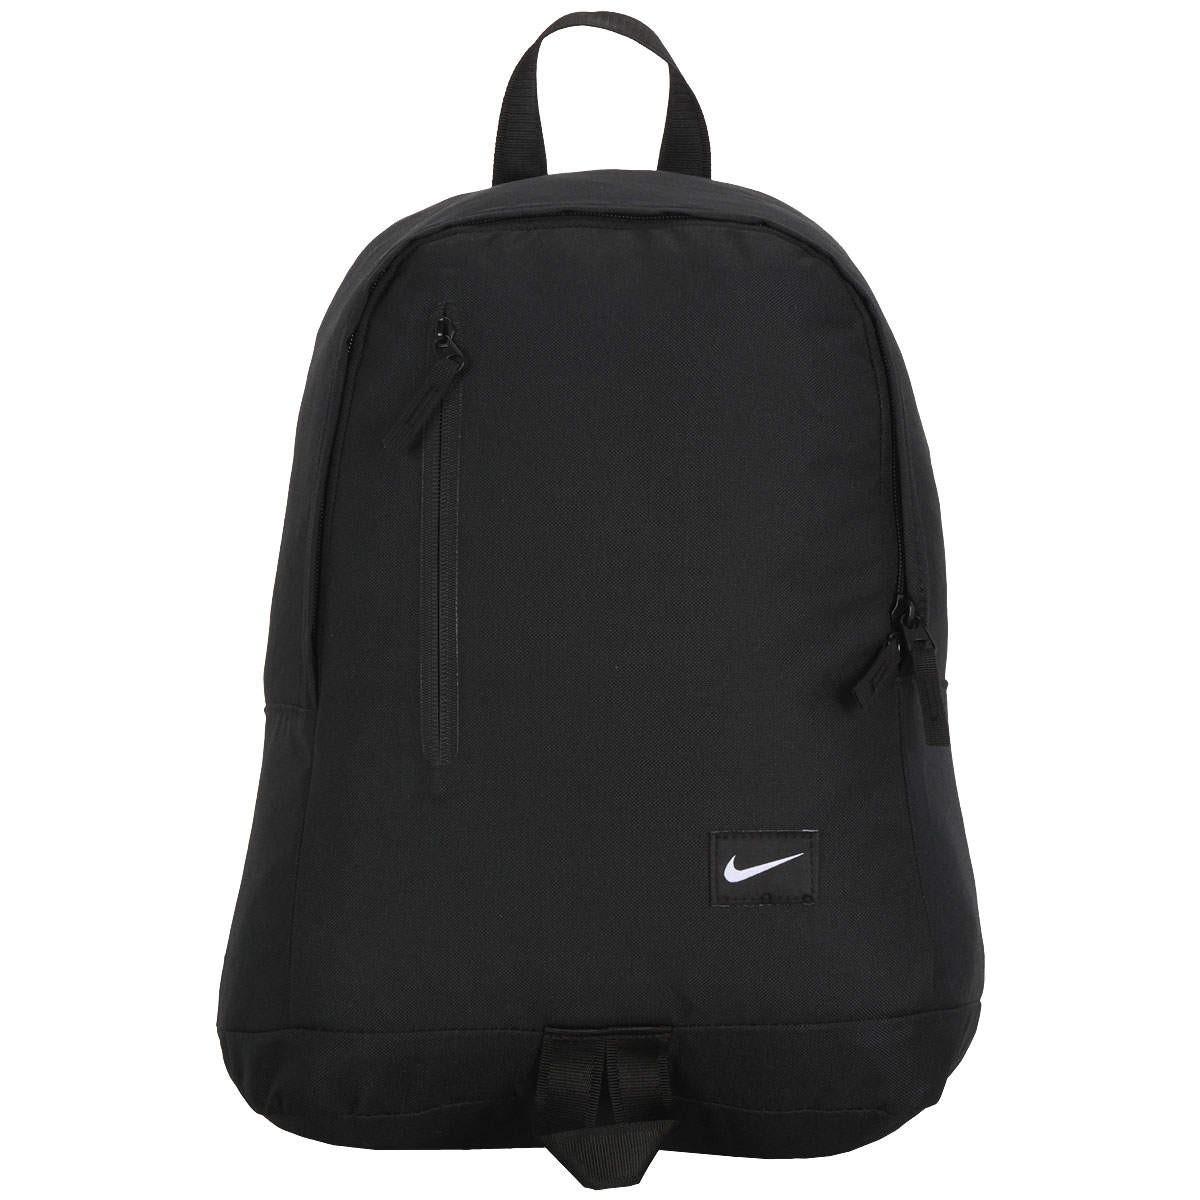 32c5983ab Bizz Store - Mochila Nike Unissex Ba4856-001 All Access Halfday